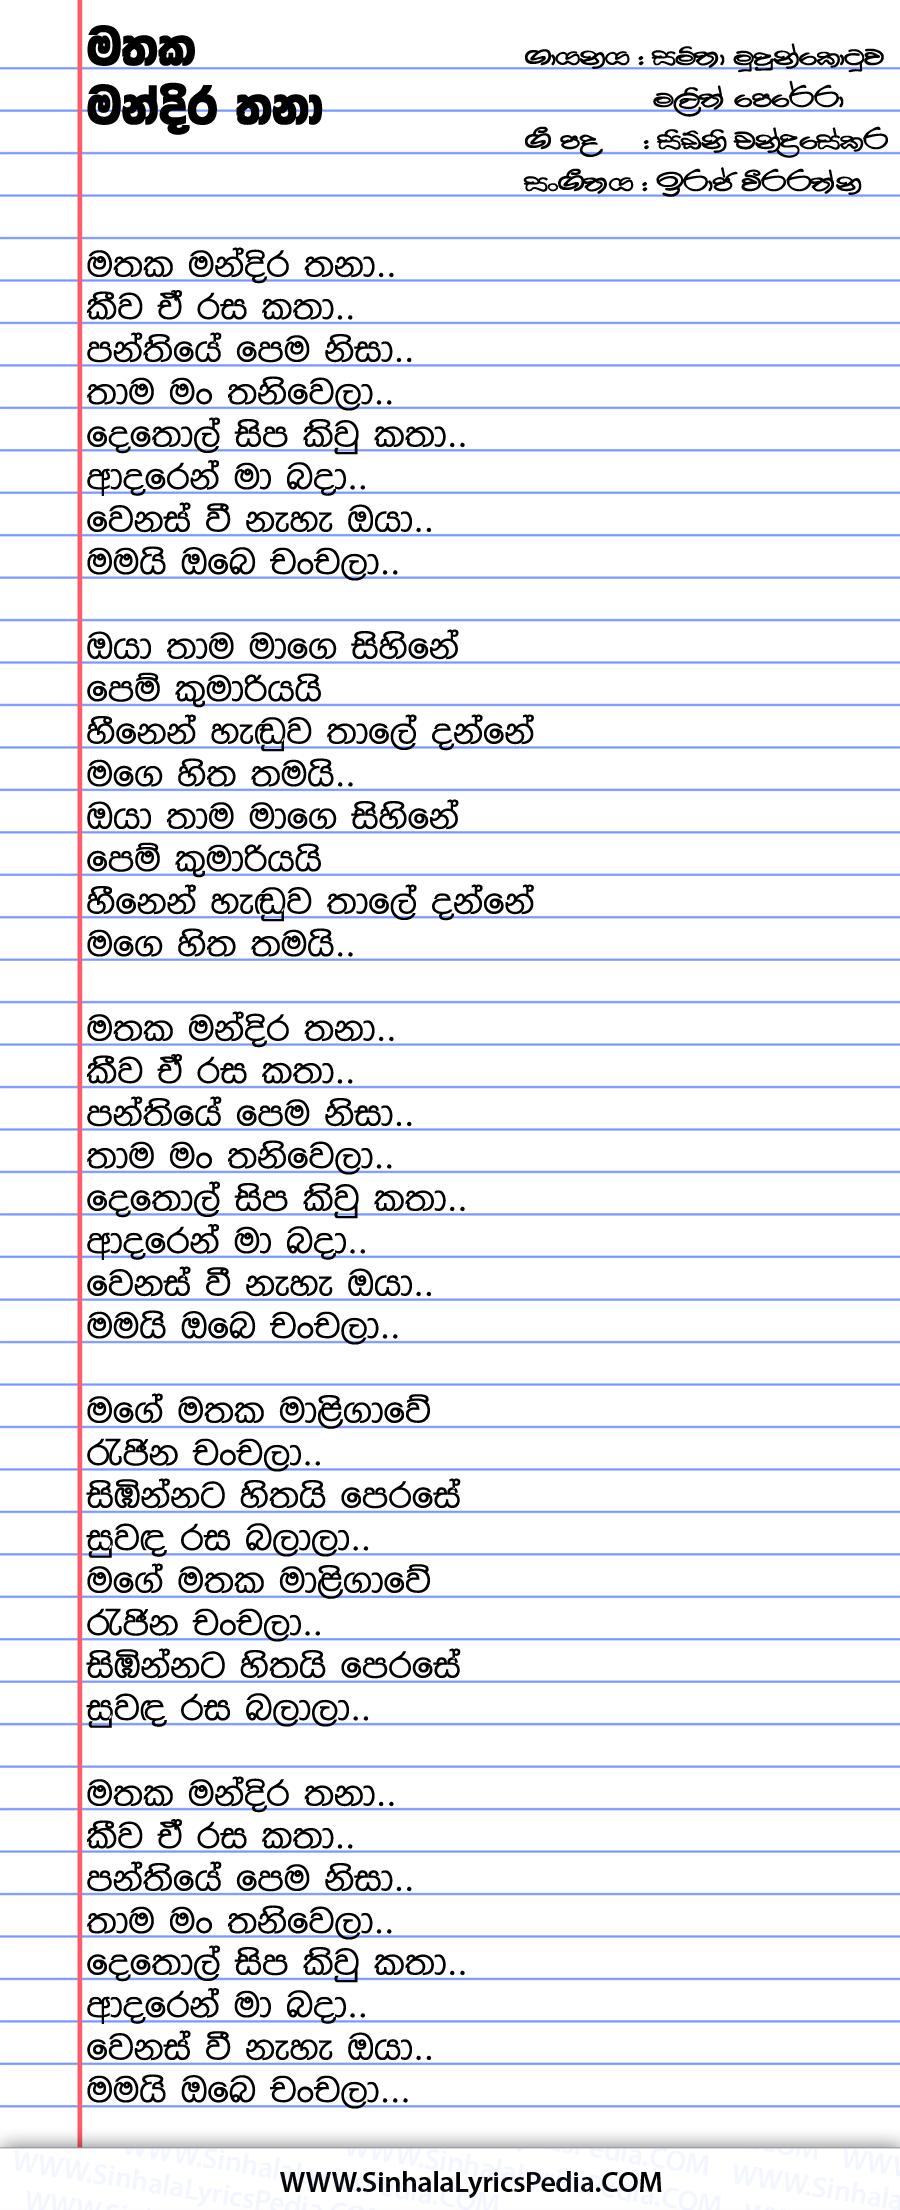 Mathaka Mandira Thana (Chanchala) Song Lyrics